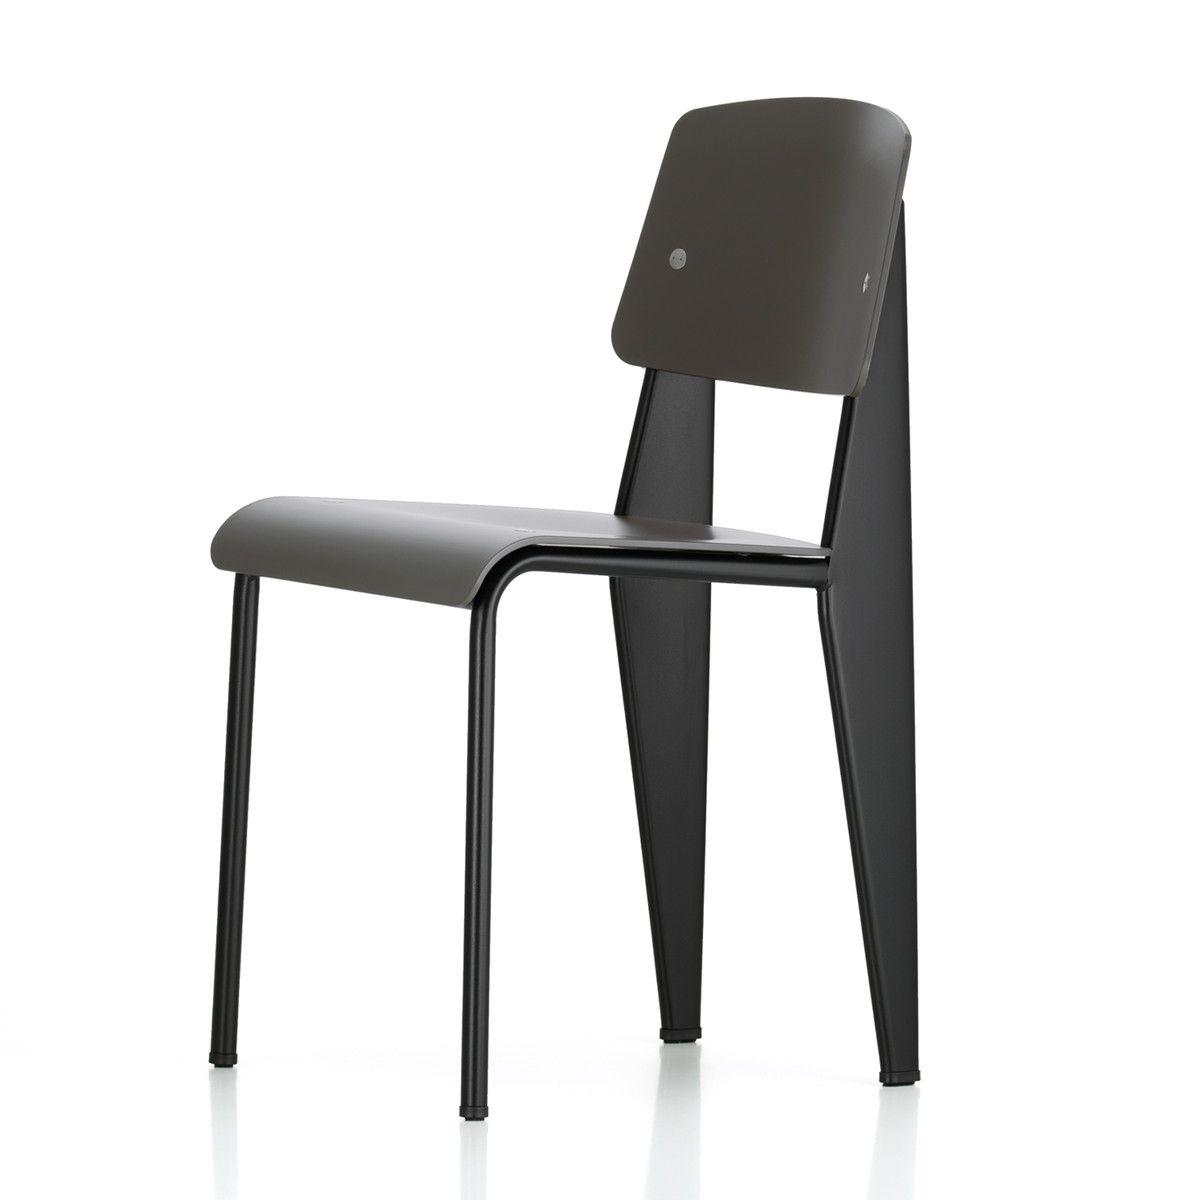 Vitra Prouve Standard Sp Chair Schwarz Basalt Filzgleiter Schwarz Hartboden Schwarz T 50 H 81 B 42 Vitra Stuhl Design Sofa Sessel